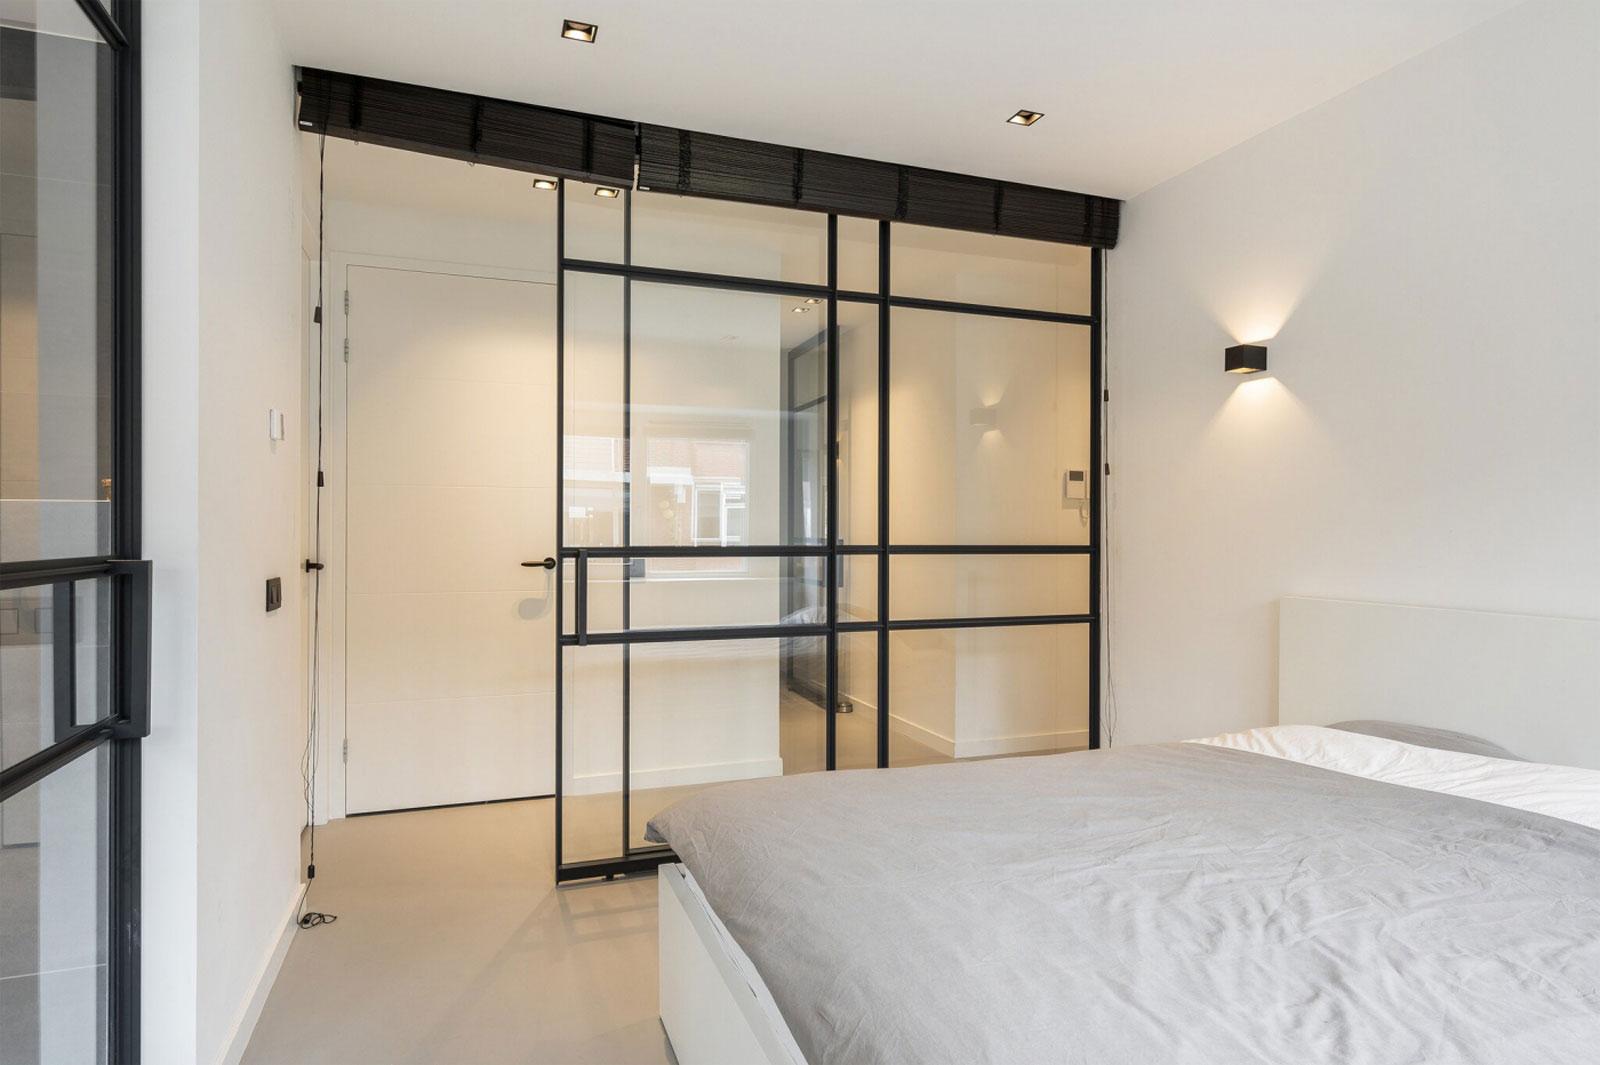 interieur slaapkamer - transformatie kantoor loftwoningen Noordsingel Rotterdam